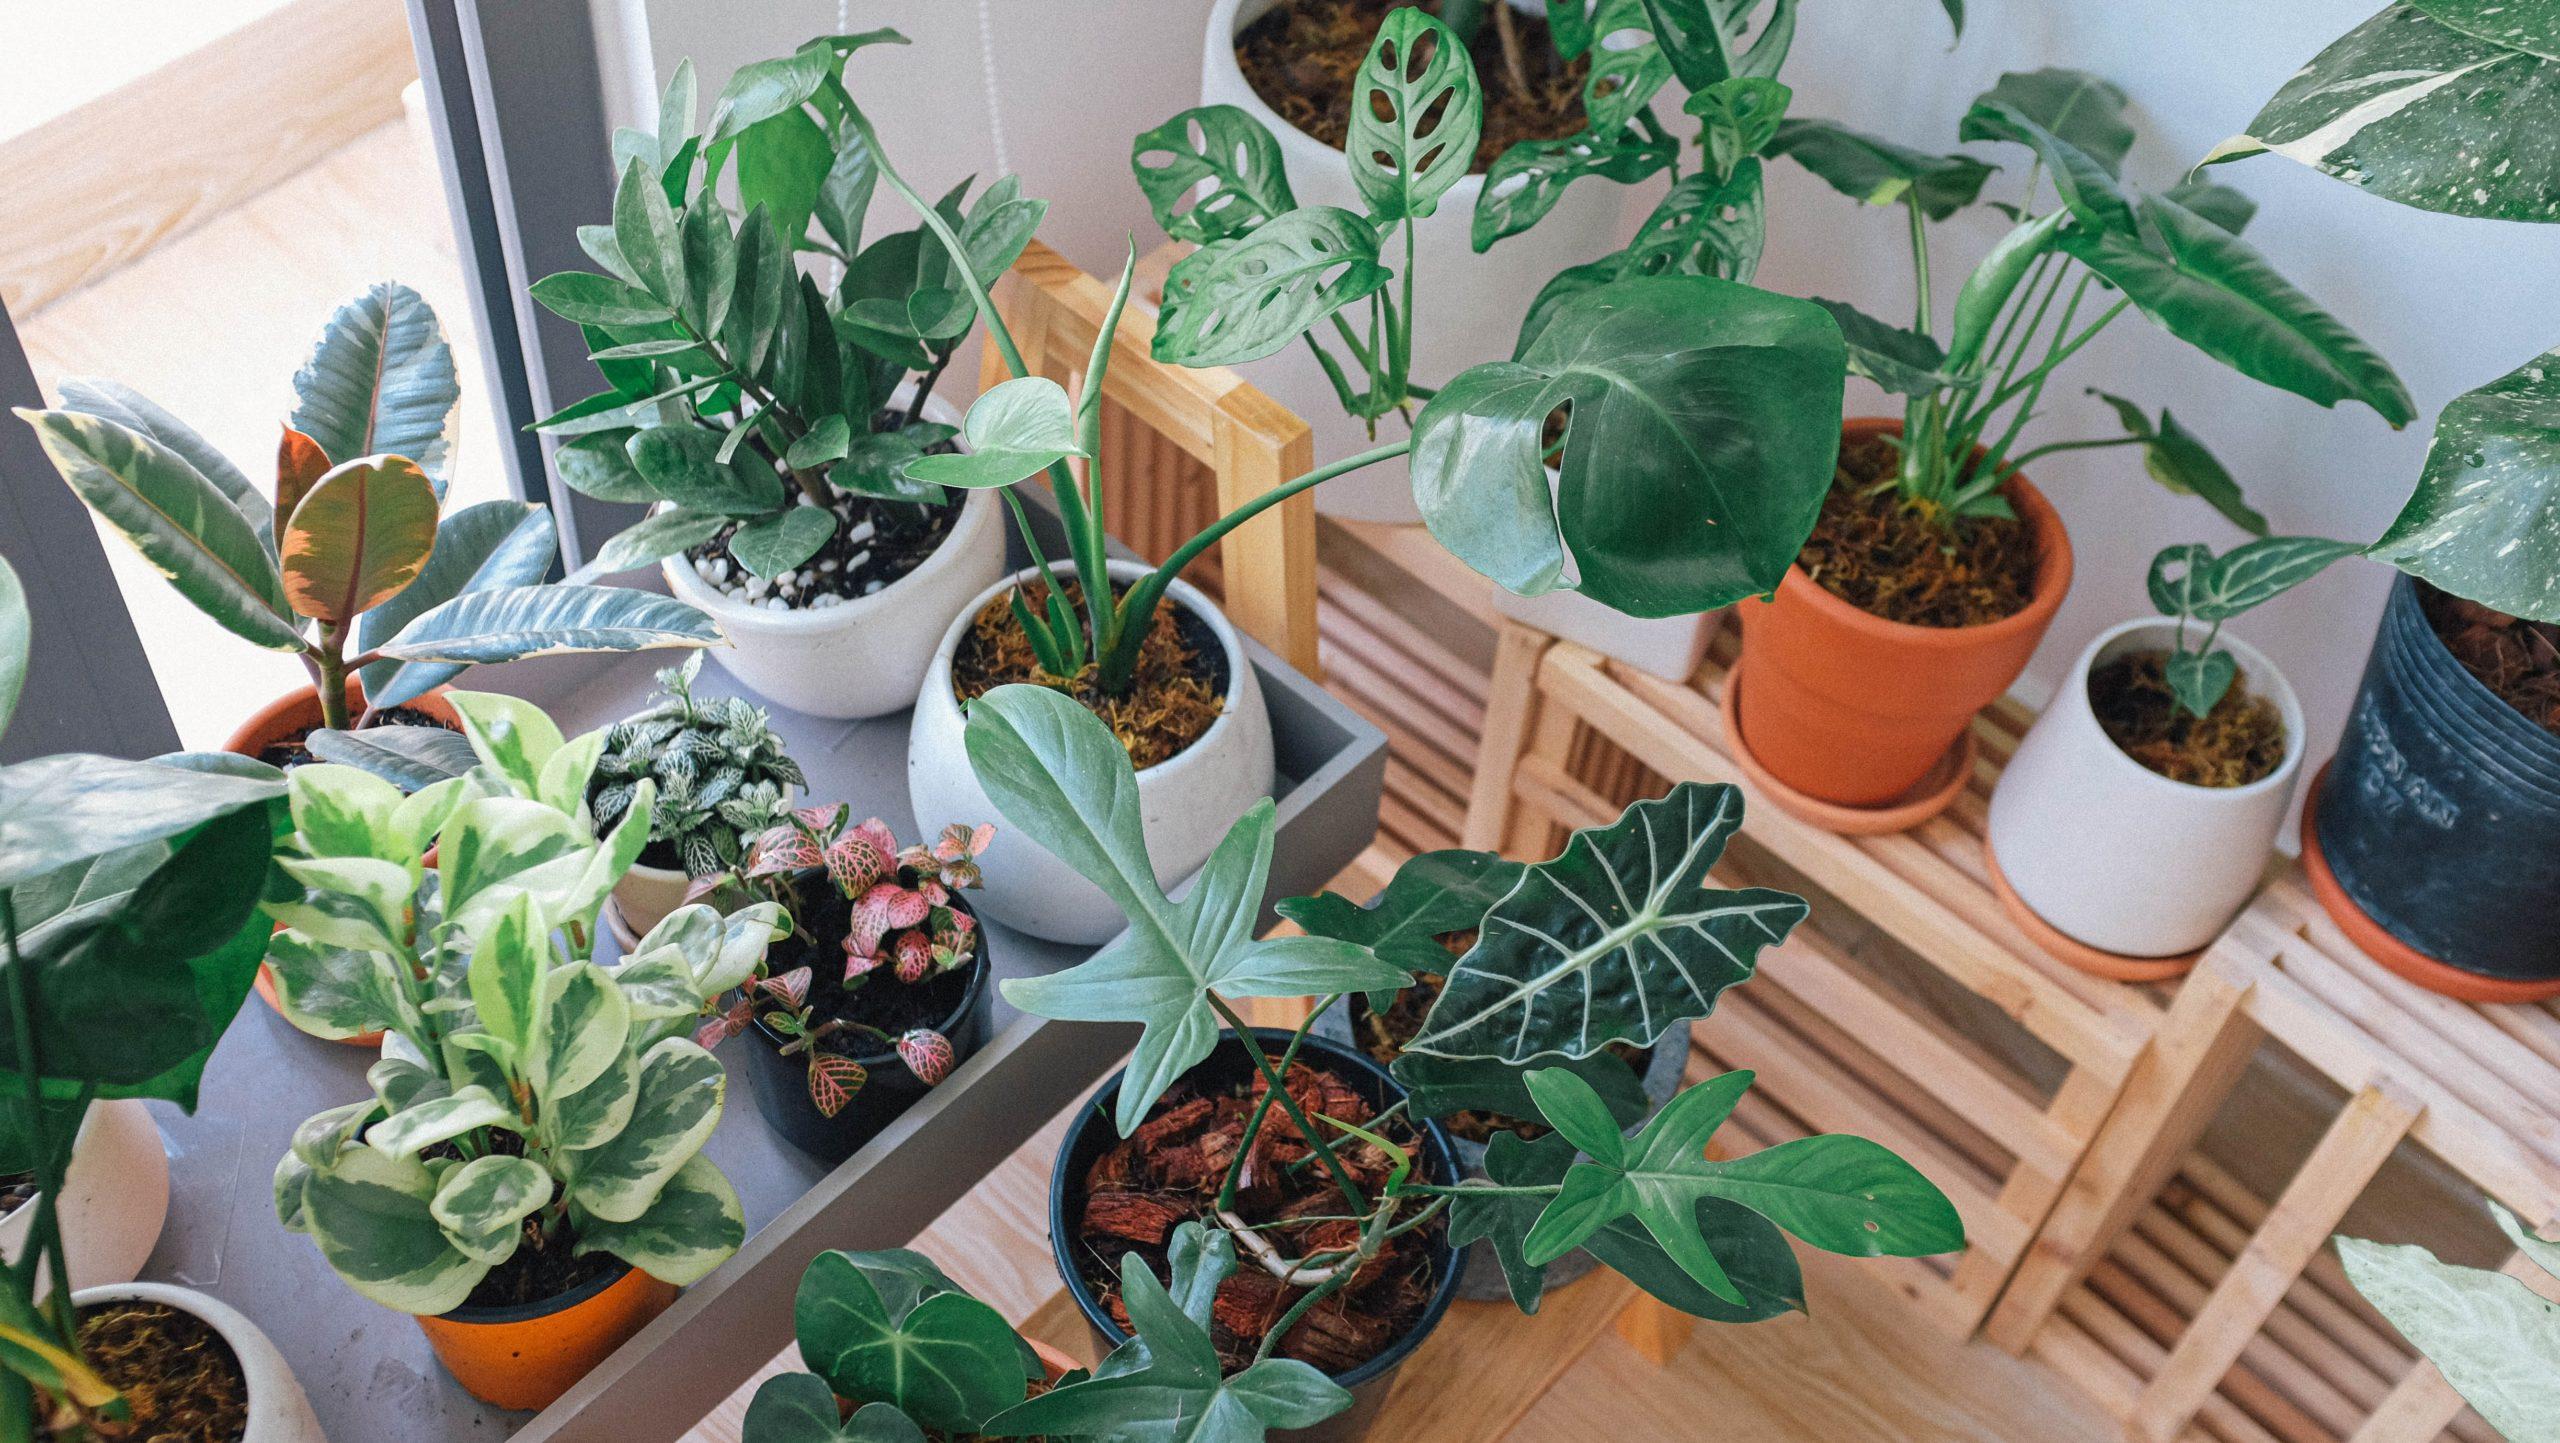 Cómo hacer macetas ecológicas para tu hogar